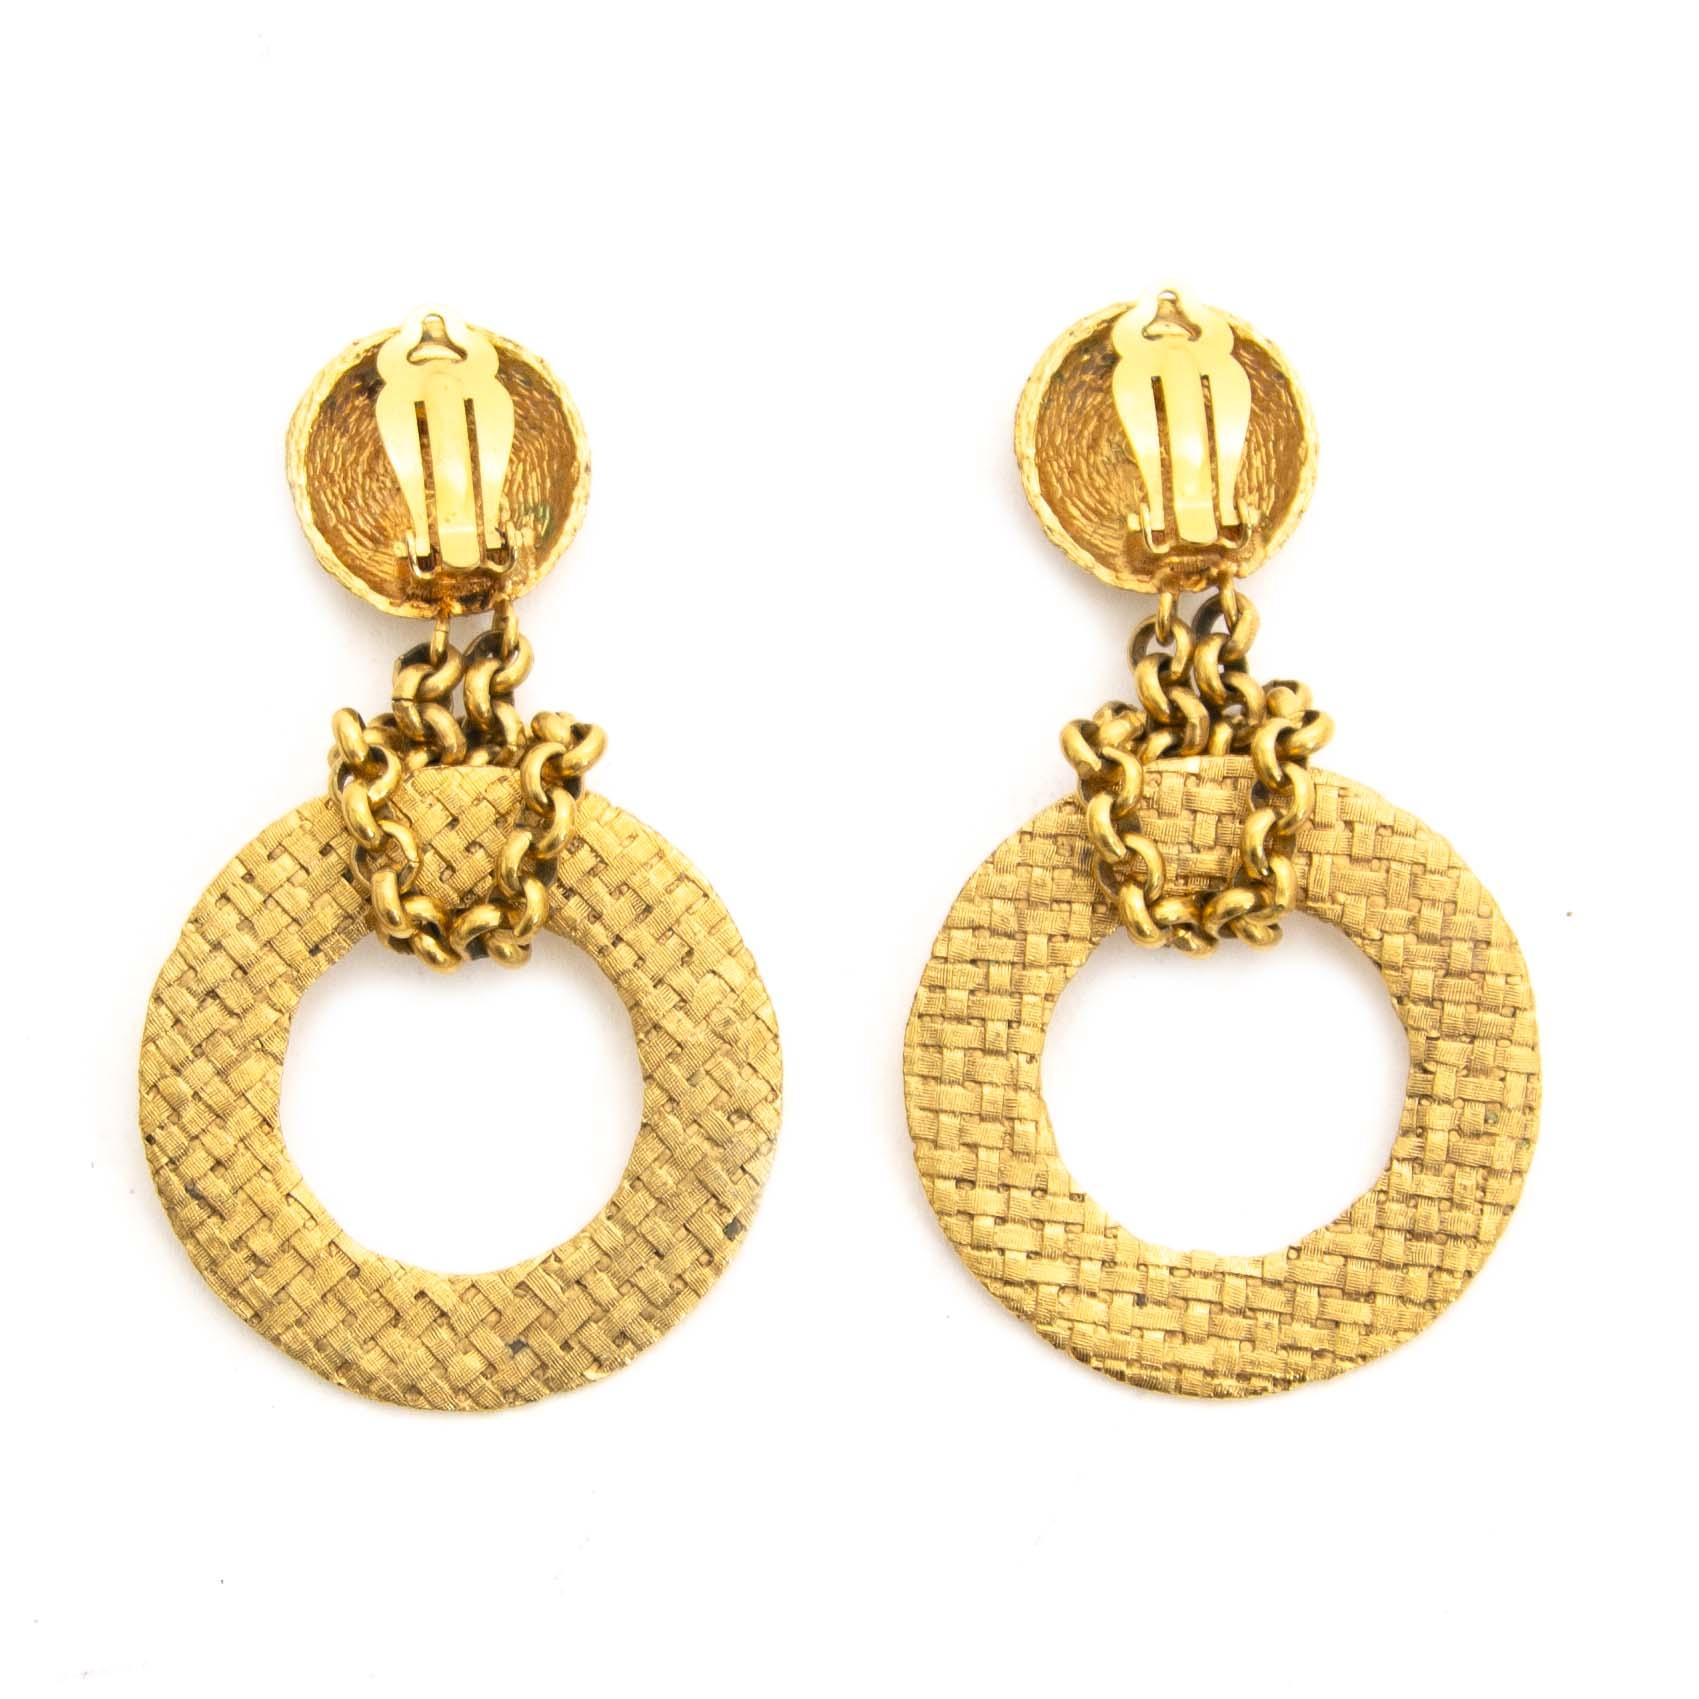 890f17c8b4d ... vintage jewellry Chanel Chain CC Gold Metal Clip-On Earrings kopen aan  de beste prijs bij Labellov